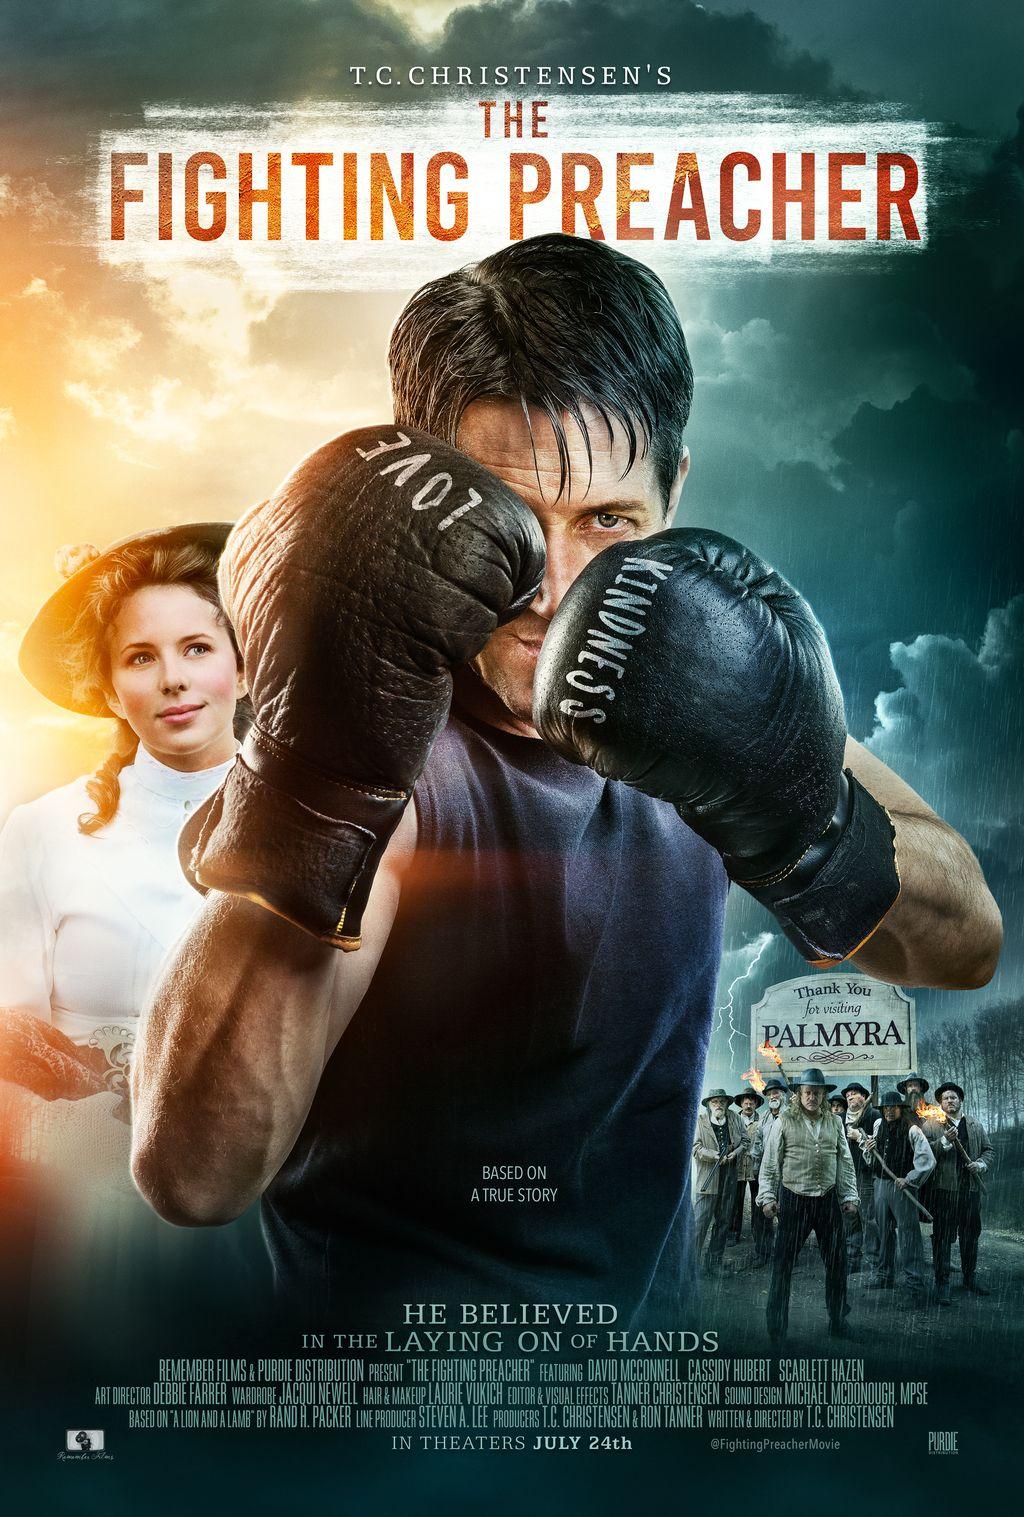 The Fighting Preacher A New Church History Film Cranial Hiccups Preacher Film Deseret Book